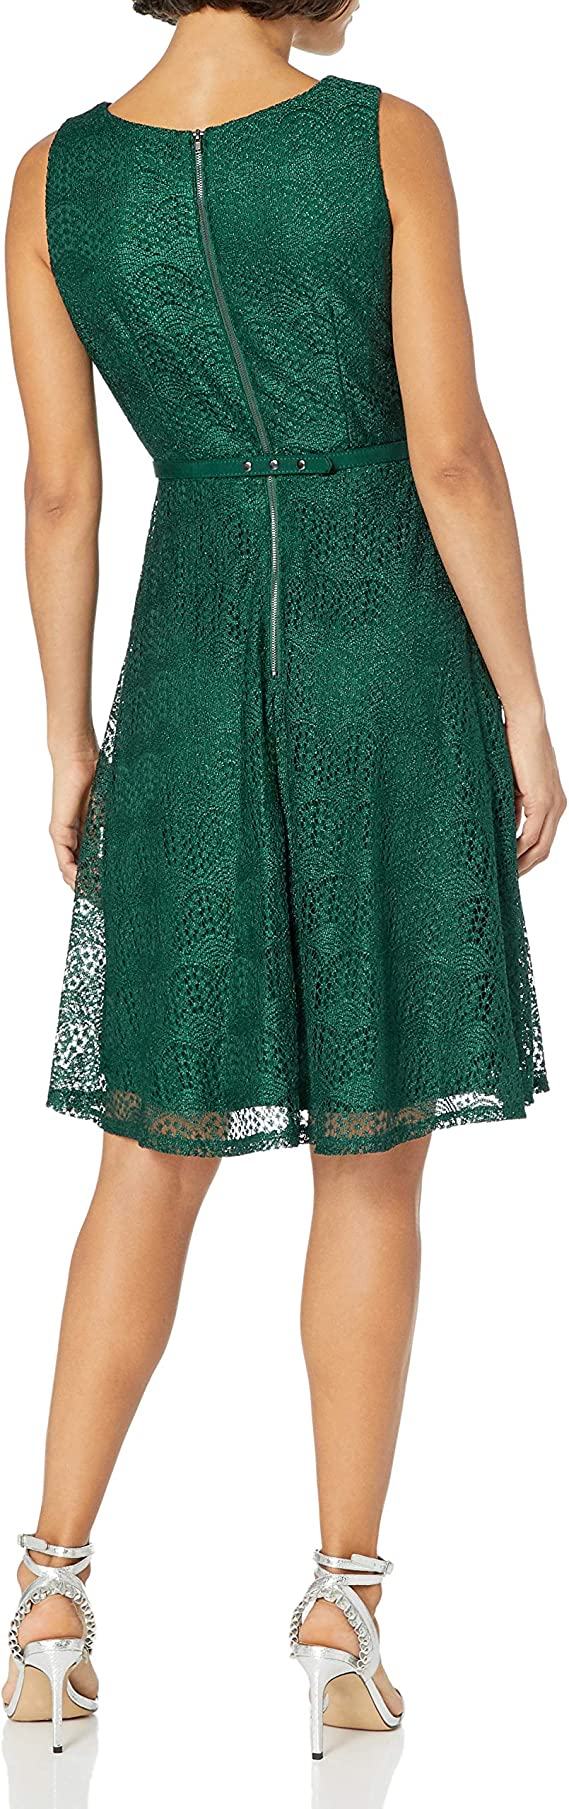 GABBY SKYE Damska Petite Sleeveless Round Neck Belted Fit and Flare Solid Crochet Lace Dress Kleid: Odzież